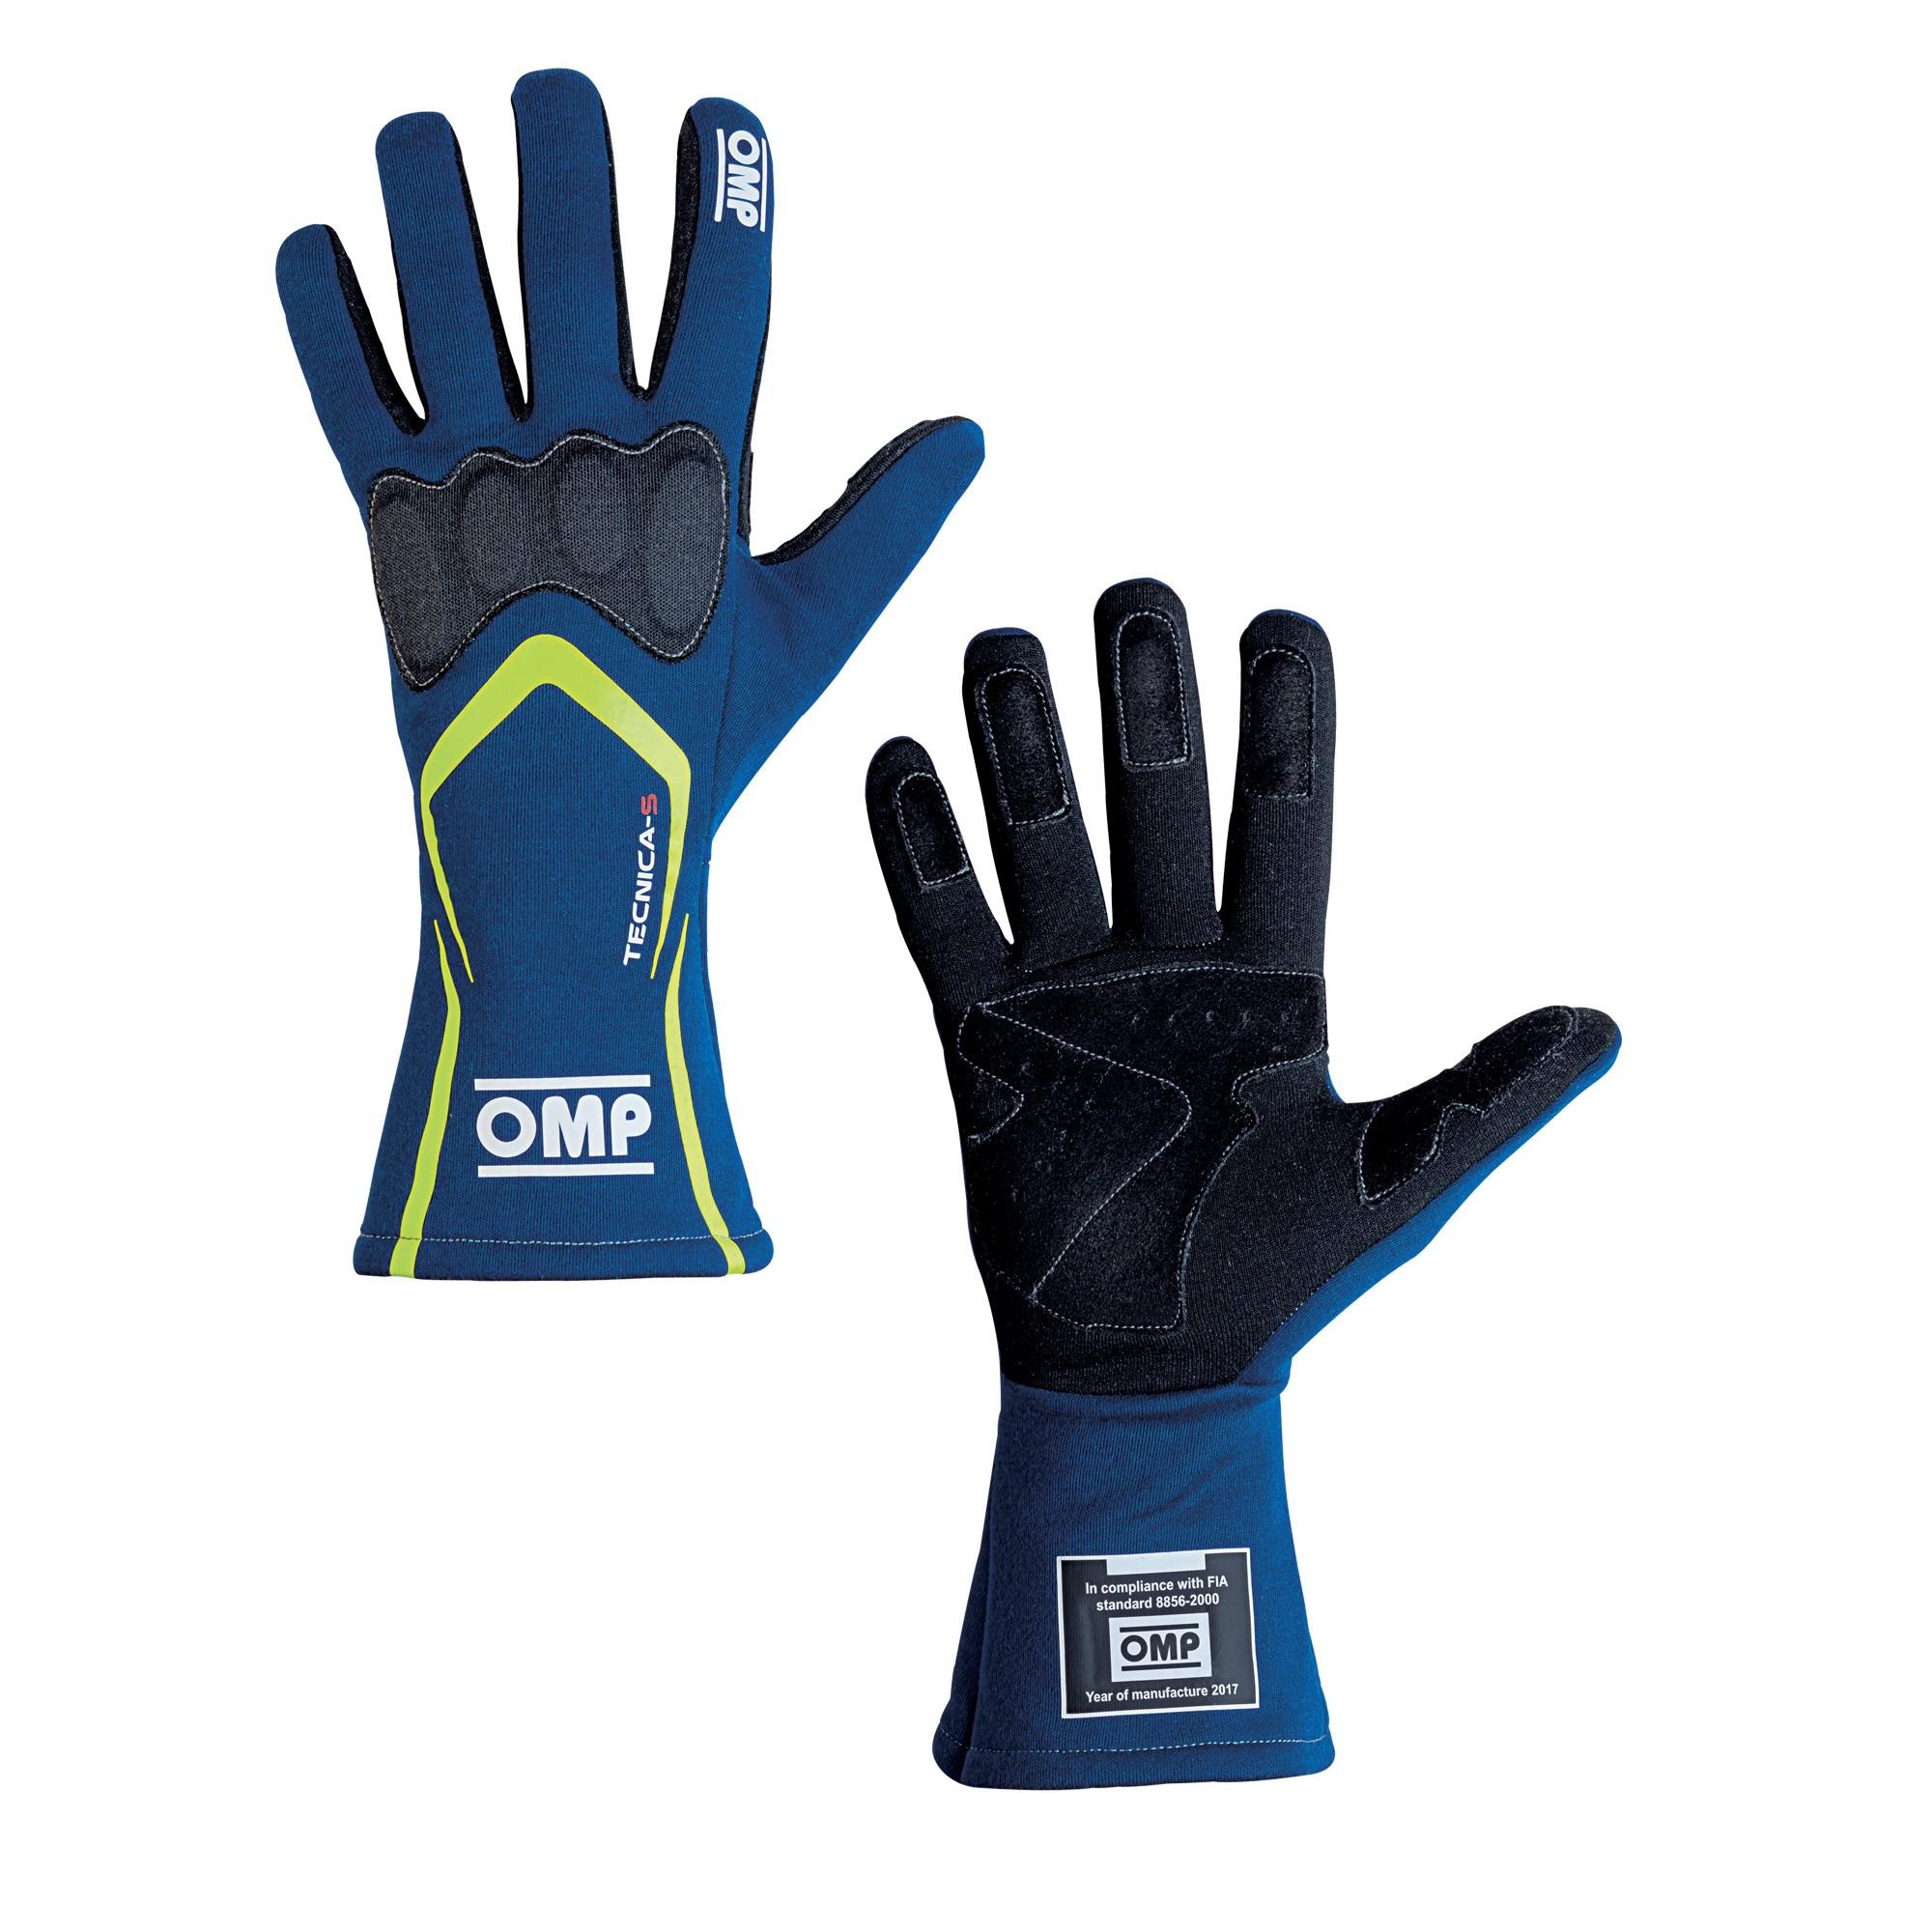 TECNICA-S Gloves